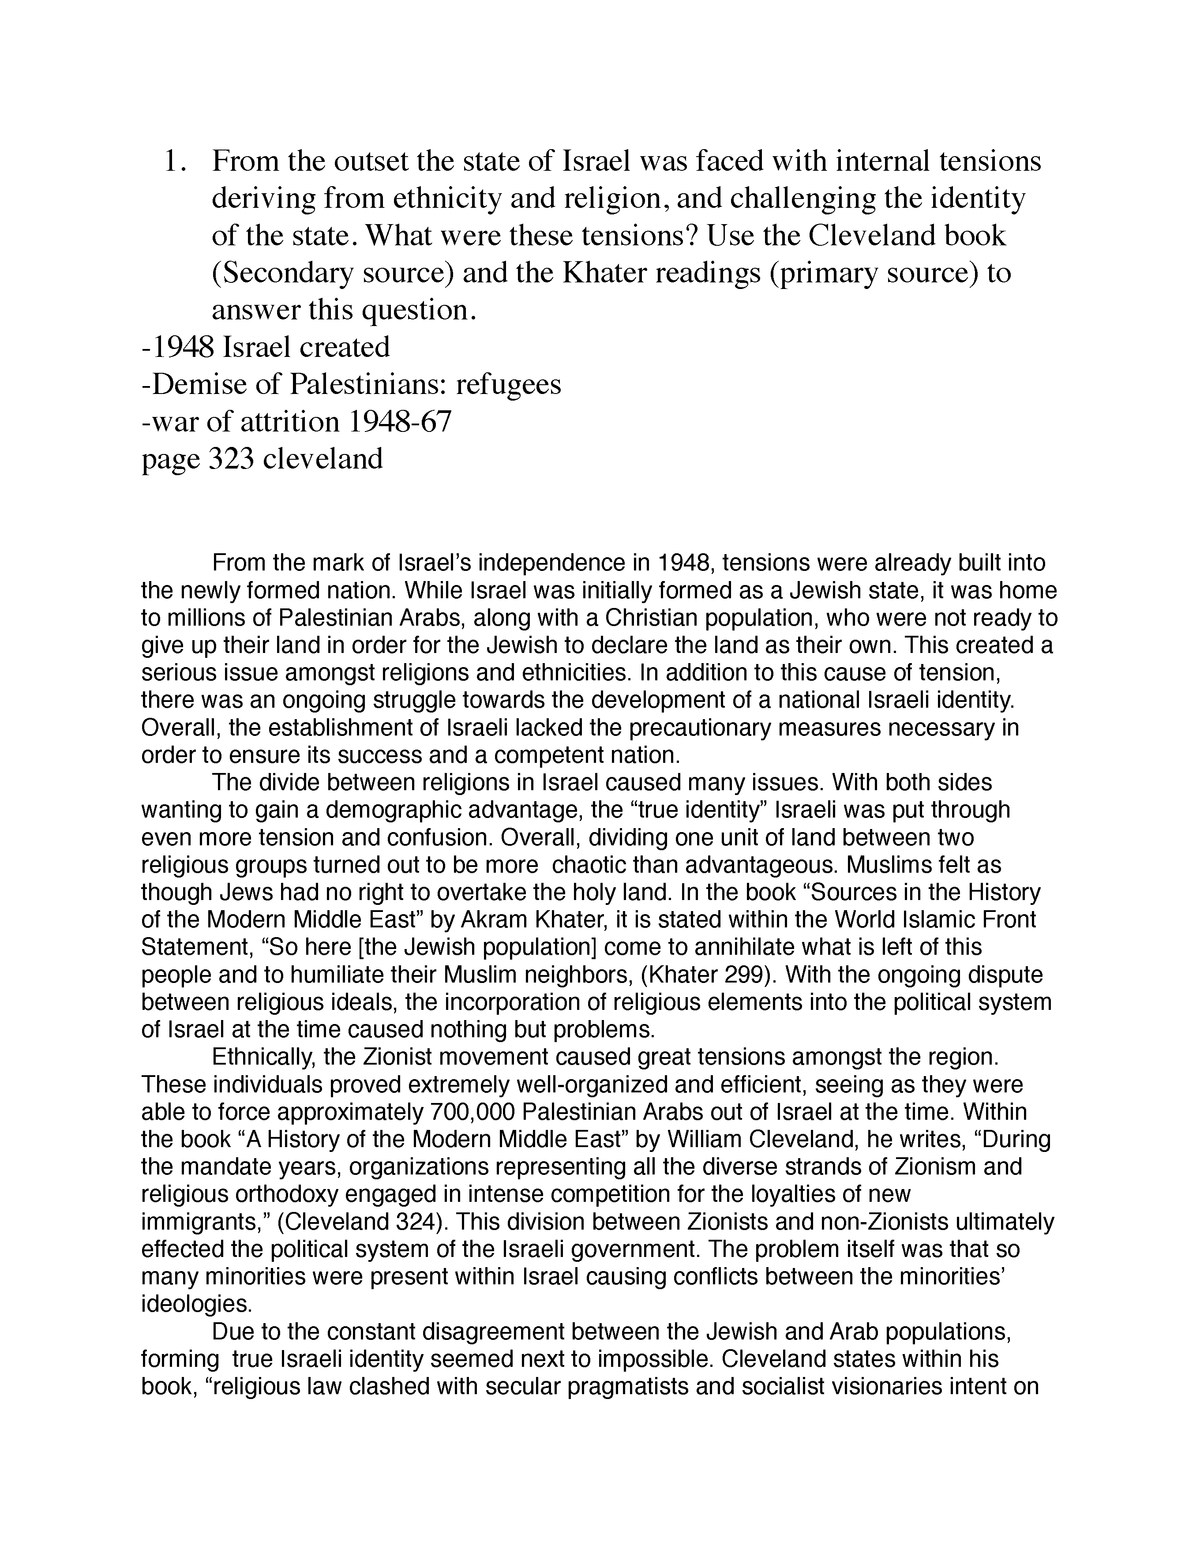 Exam 2013 - HI 270: Modern Middle East - StuDocu